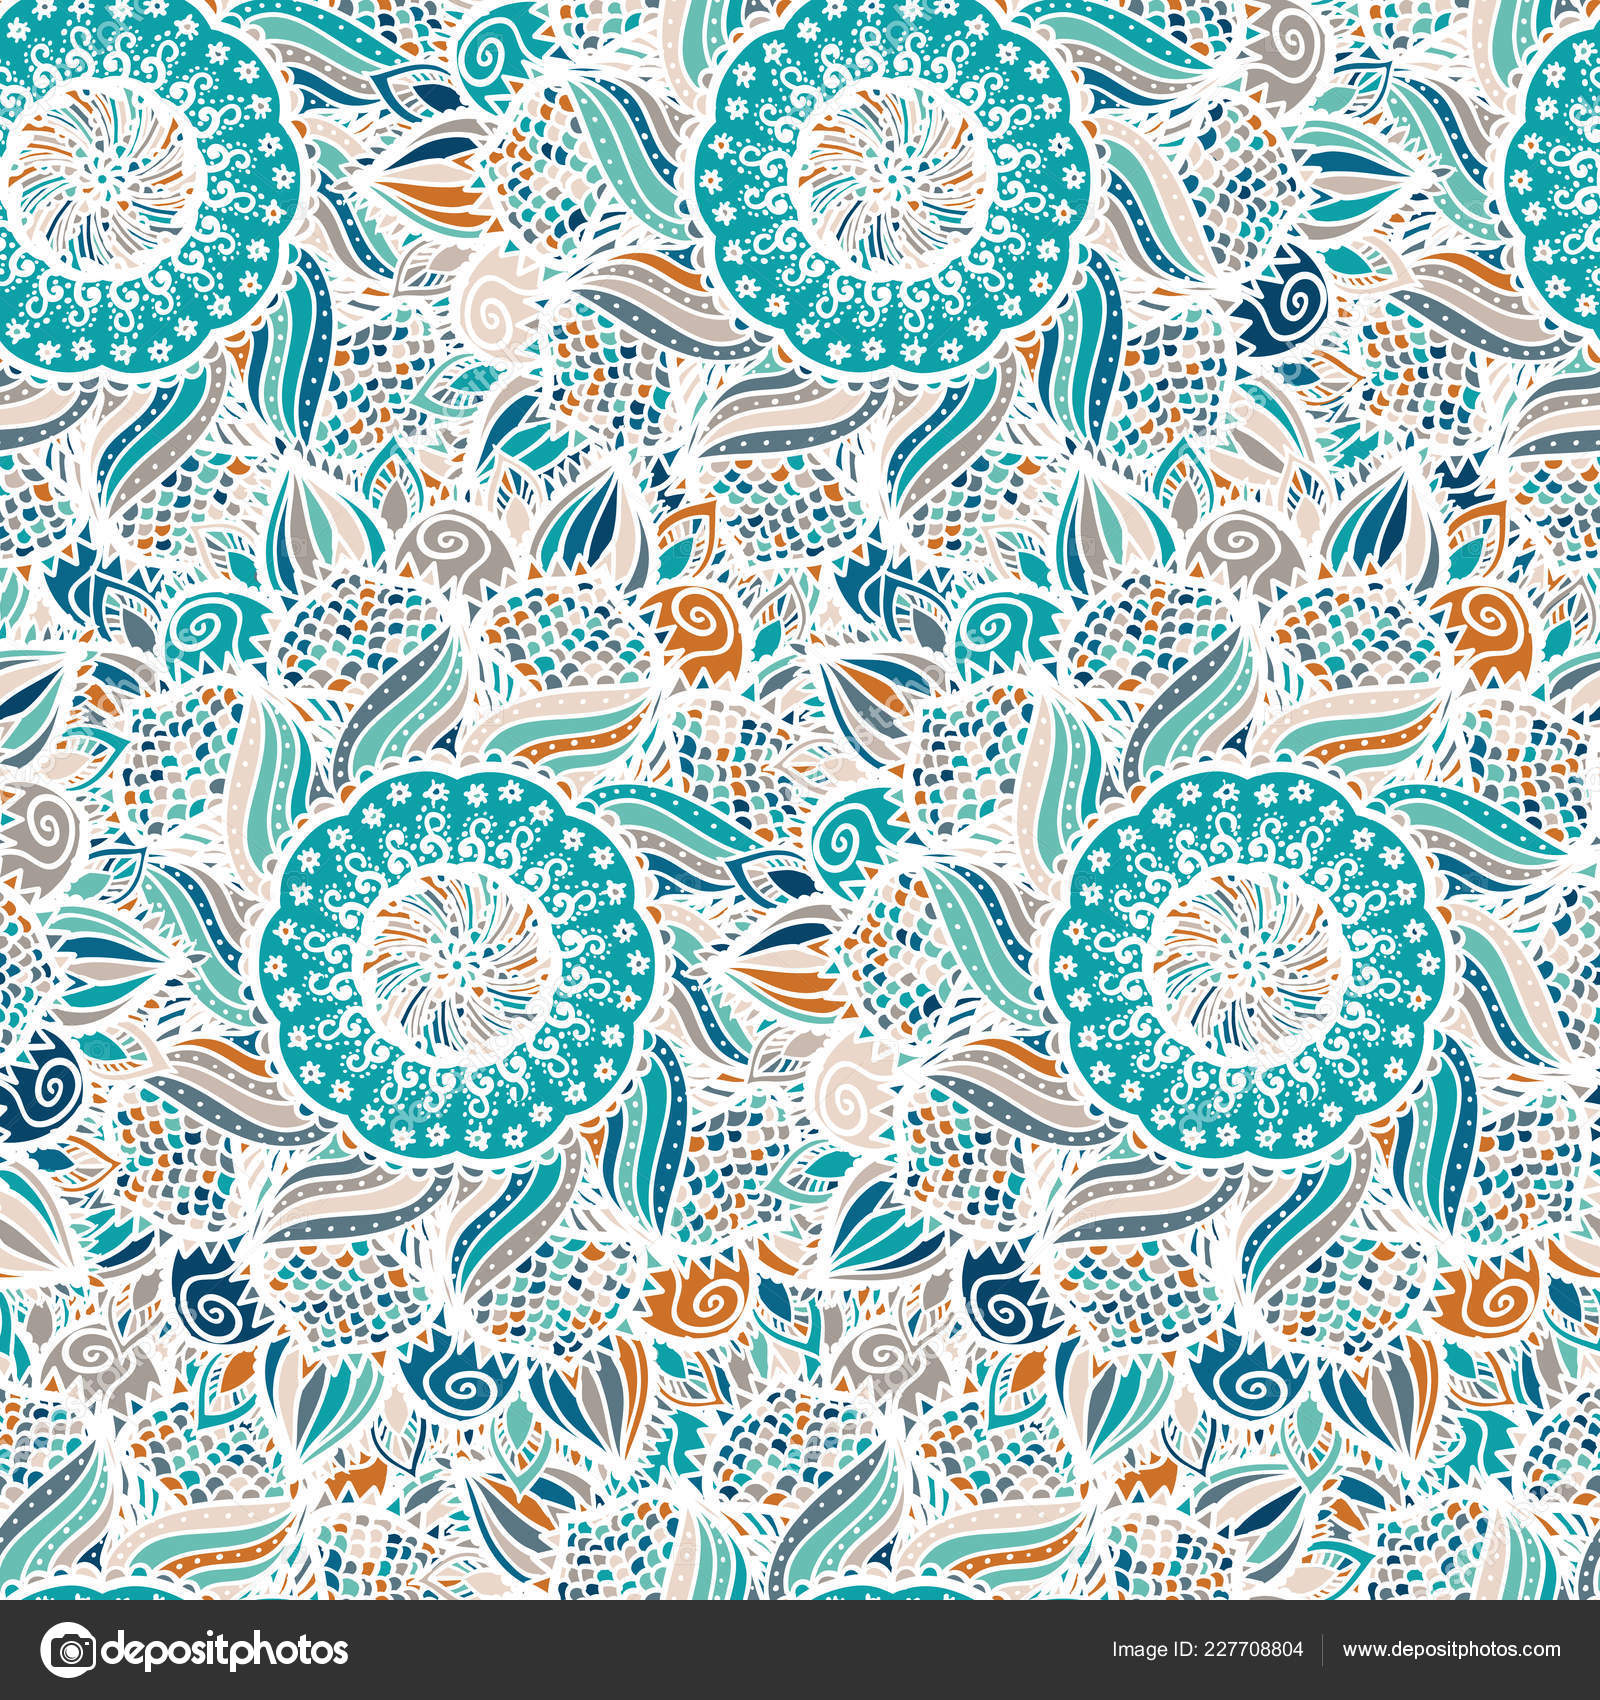 Patrón Abstracto Vector Floral Sin Fisuras Mandalas Coloridos Azul